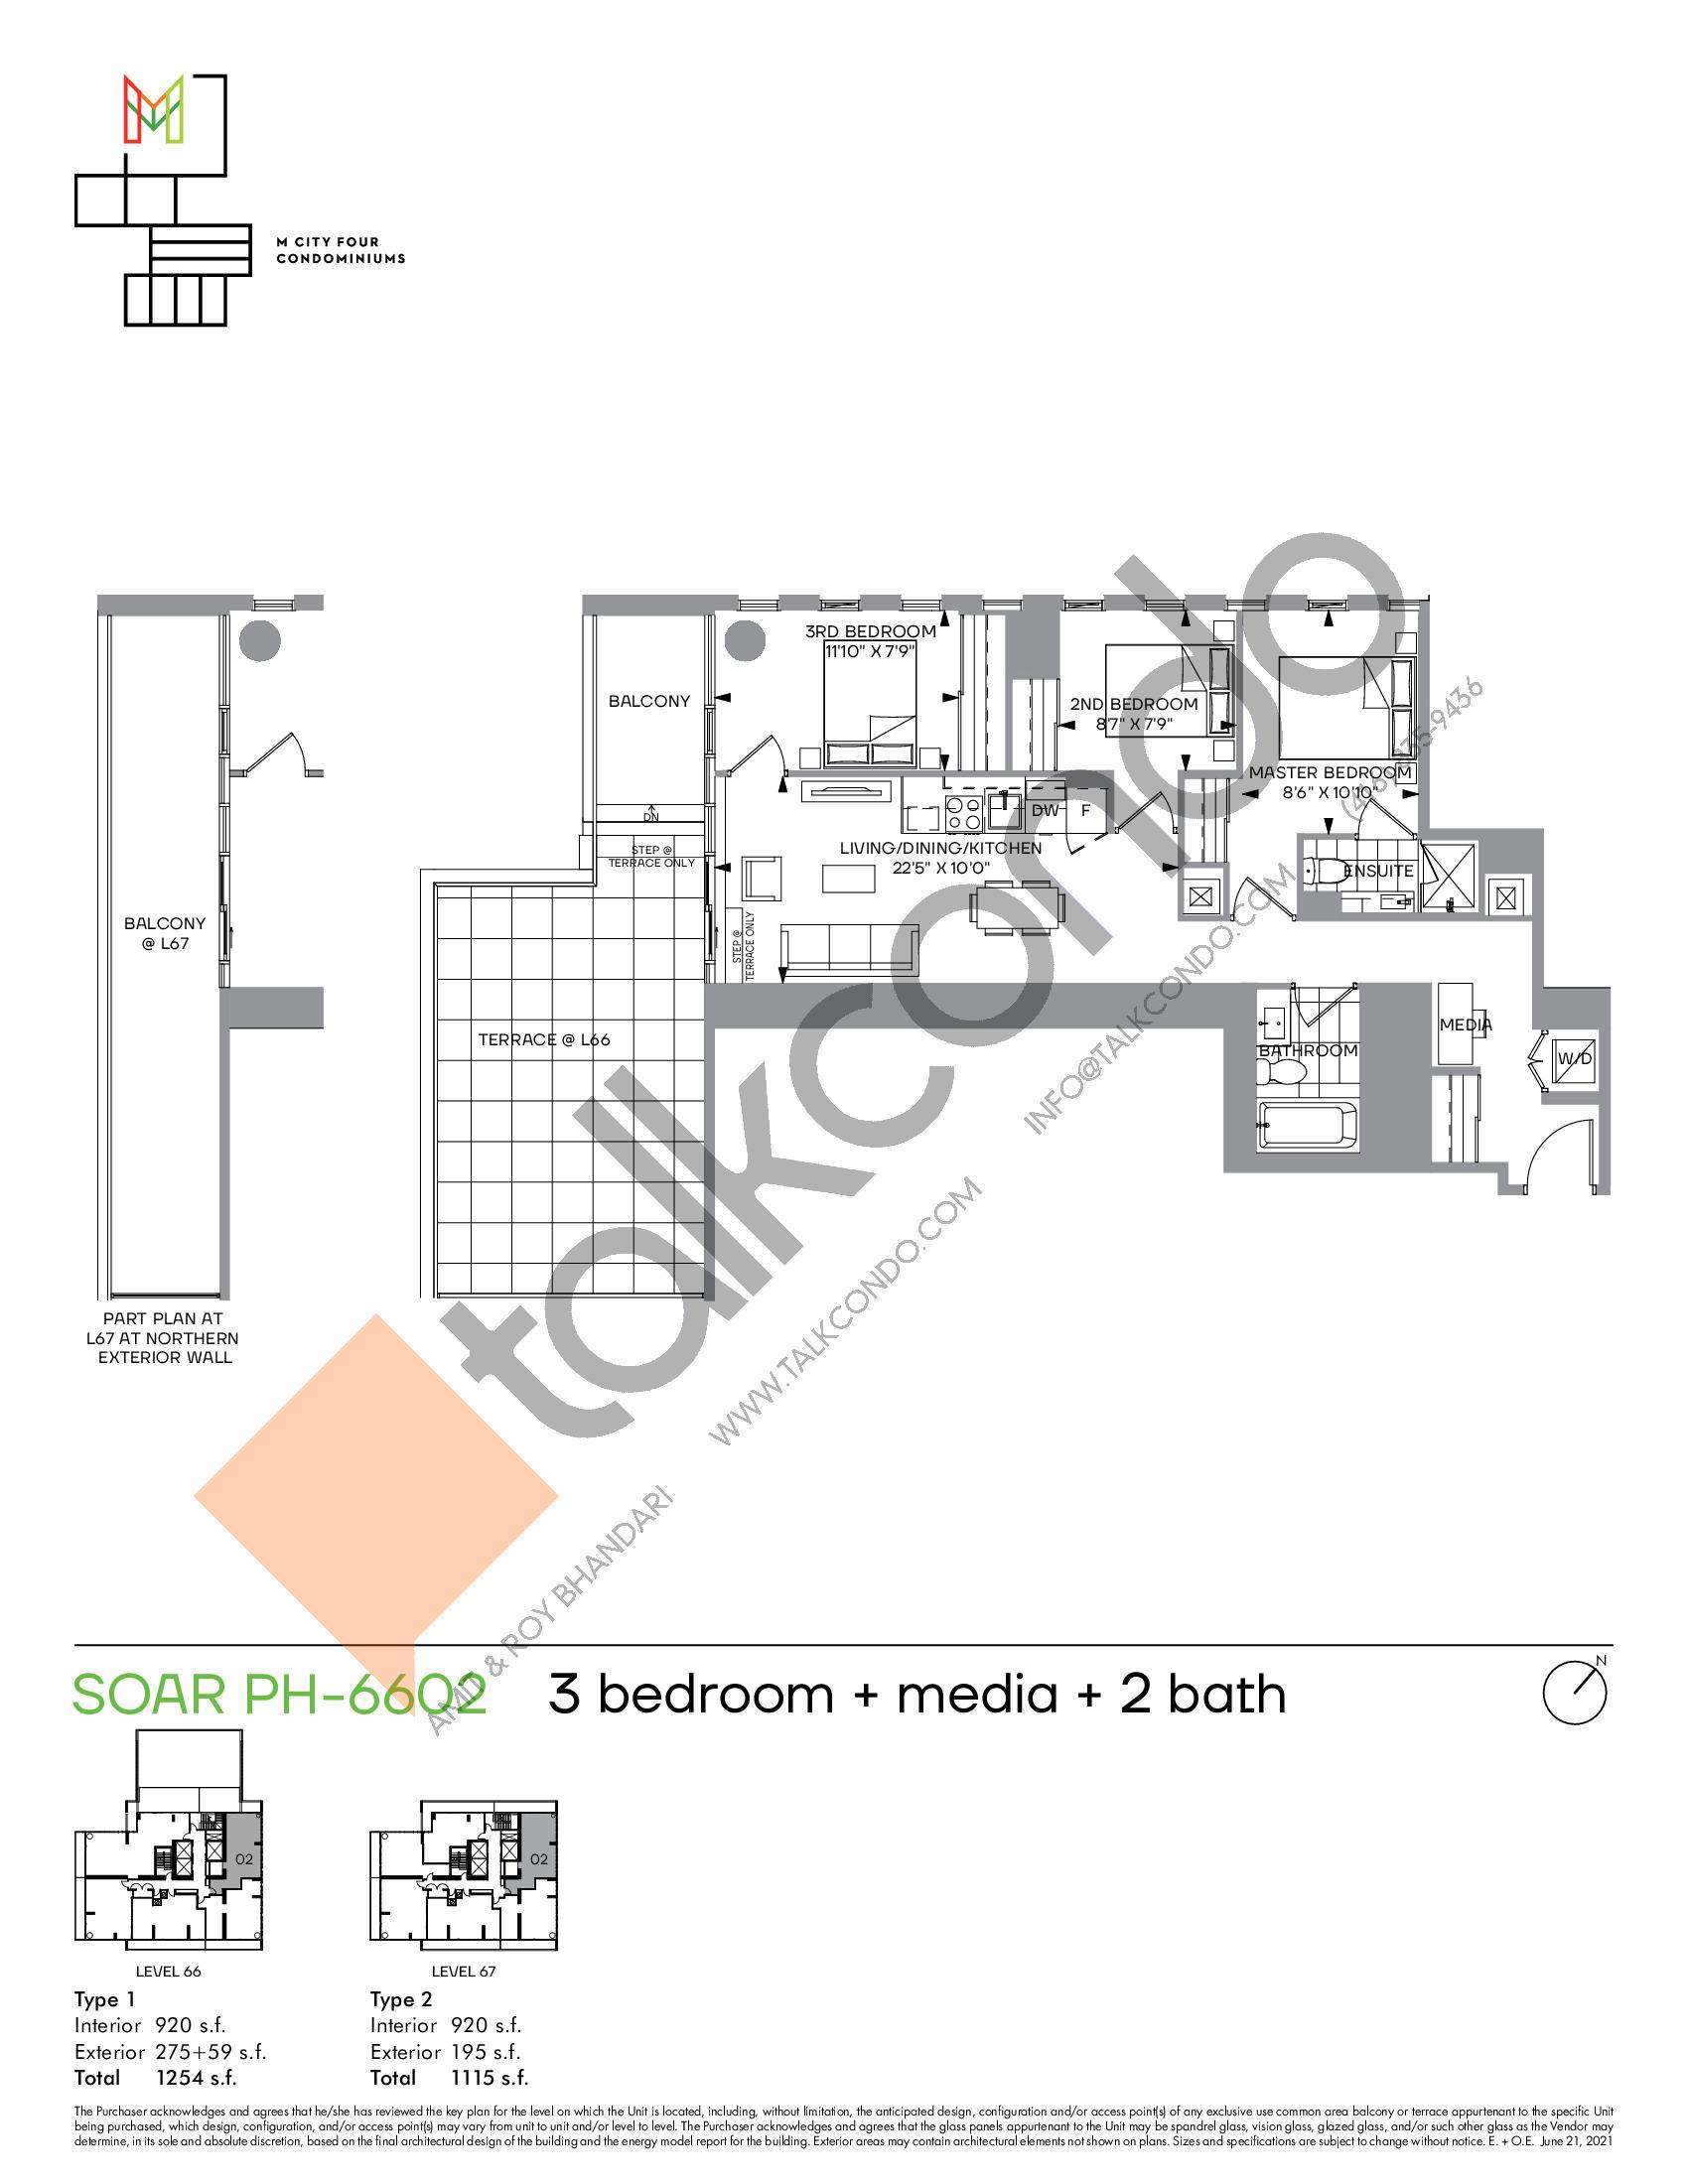 Soar PH-6602 Floor Plan at M4 Condos - 920 sq.ft